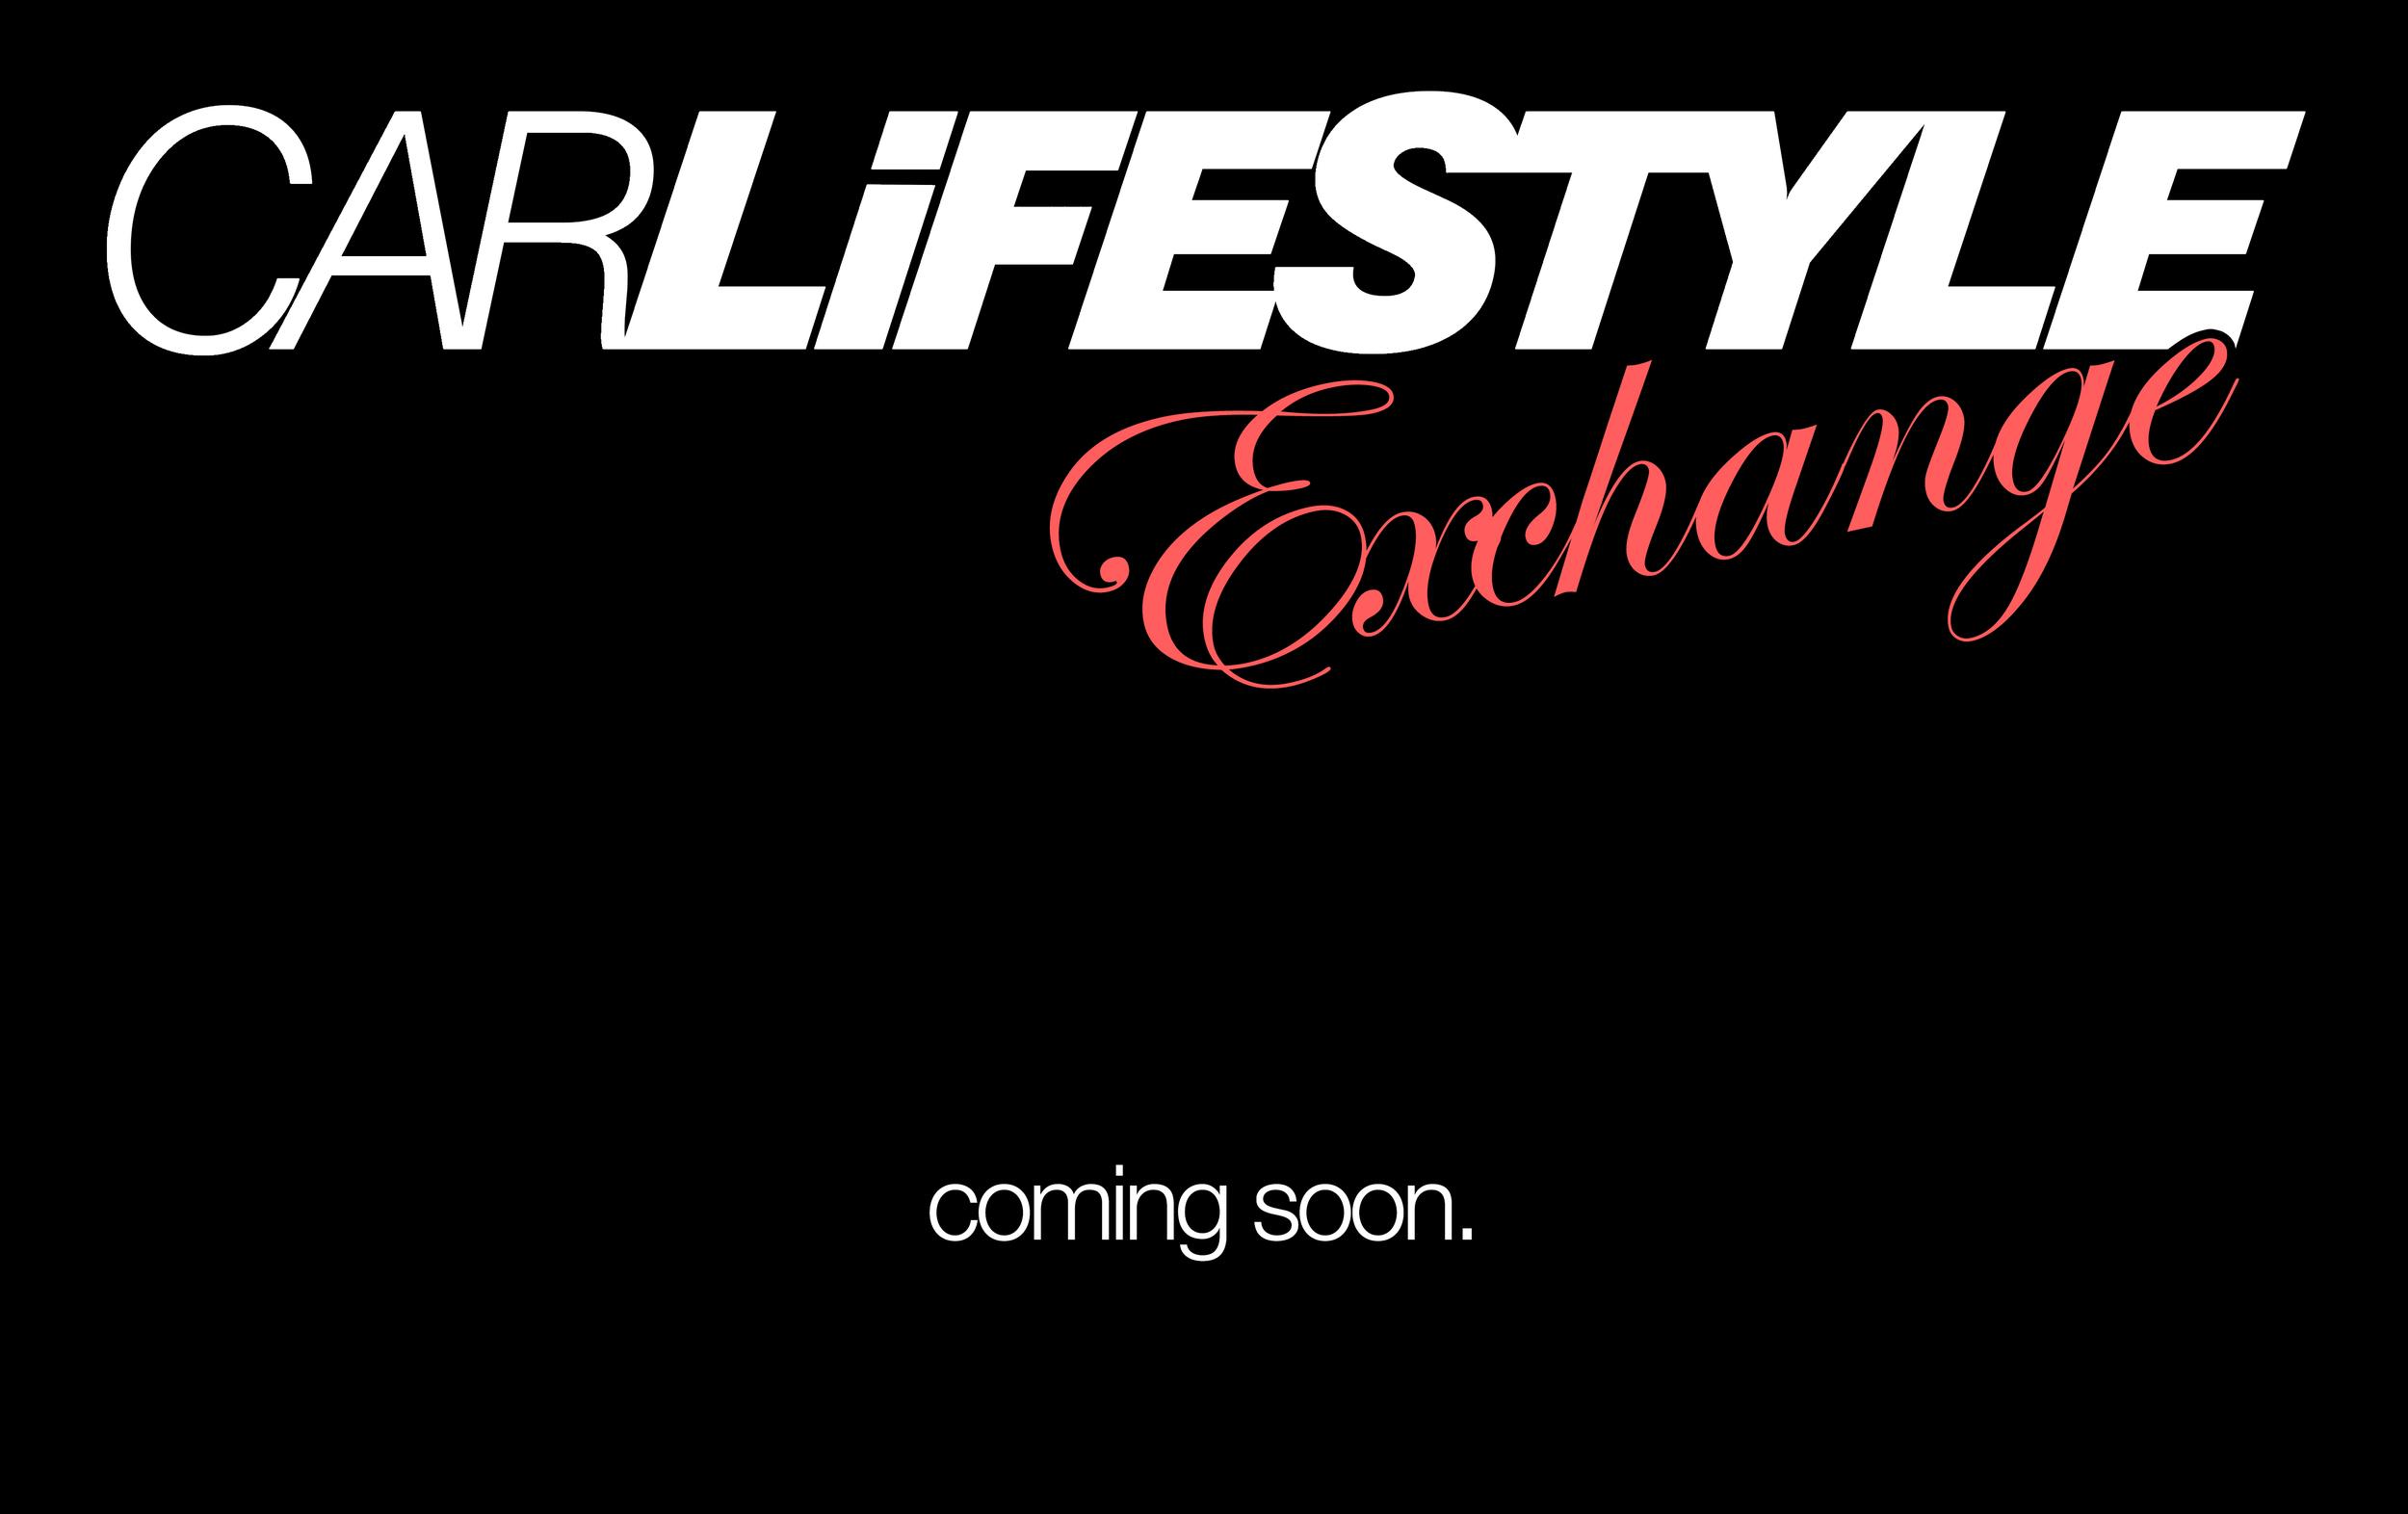 carlifestyle exchange.jpg